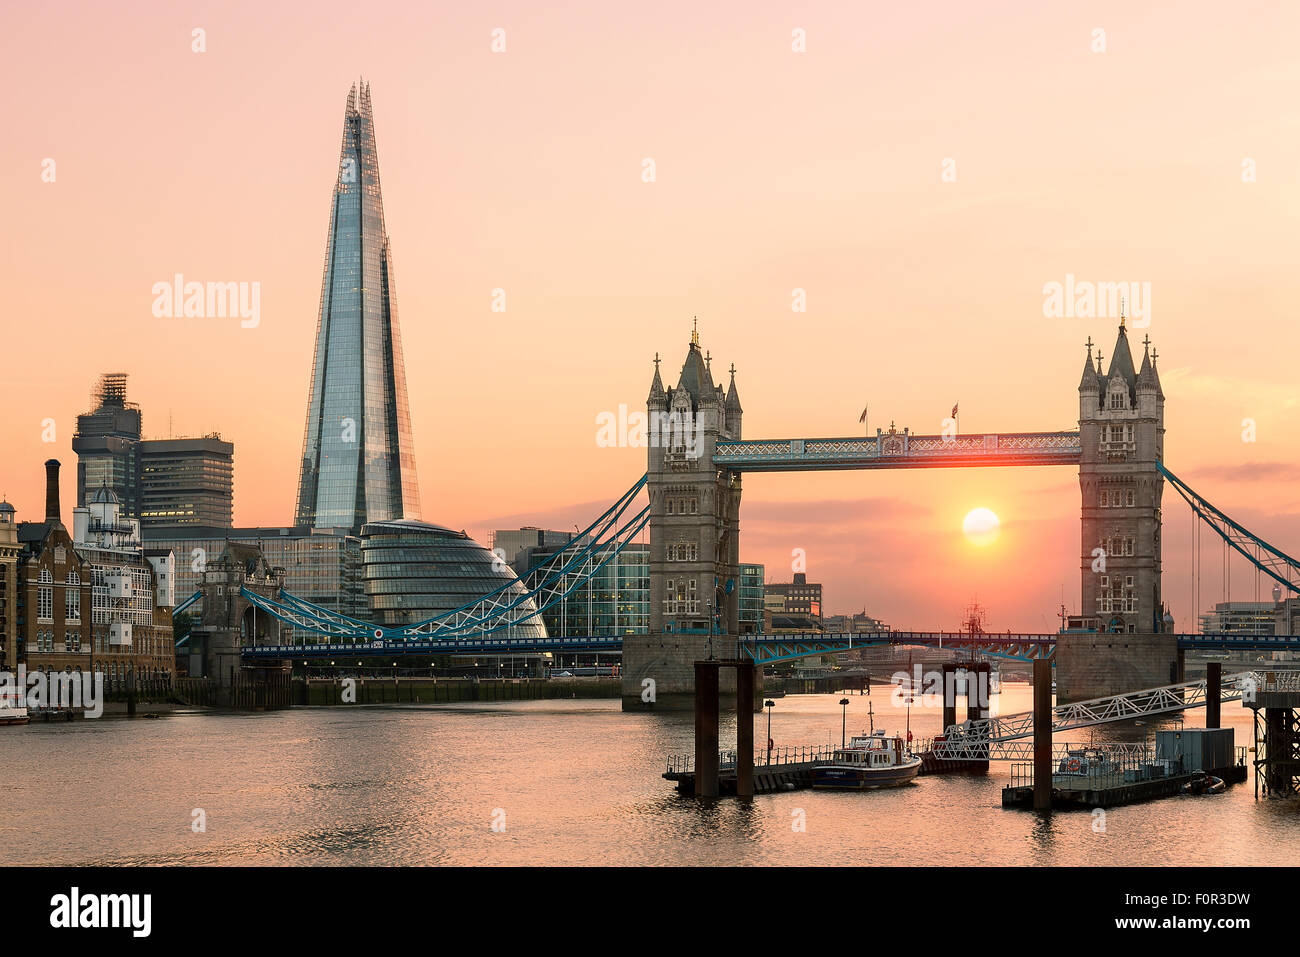 London, Tower Bridge und Shard London Bridge bei Sonnenuntergang Stockfoto